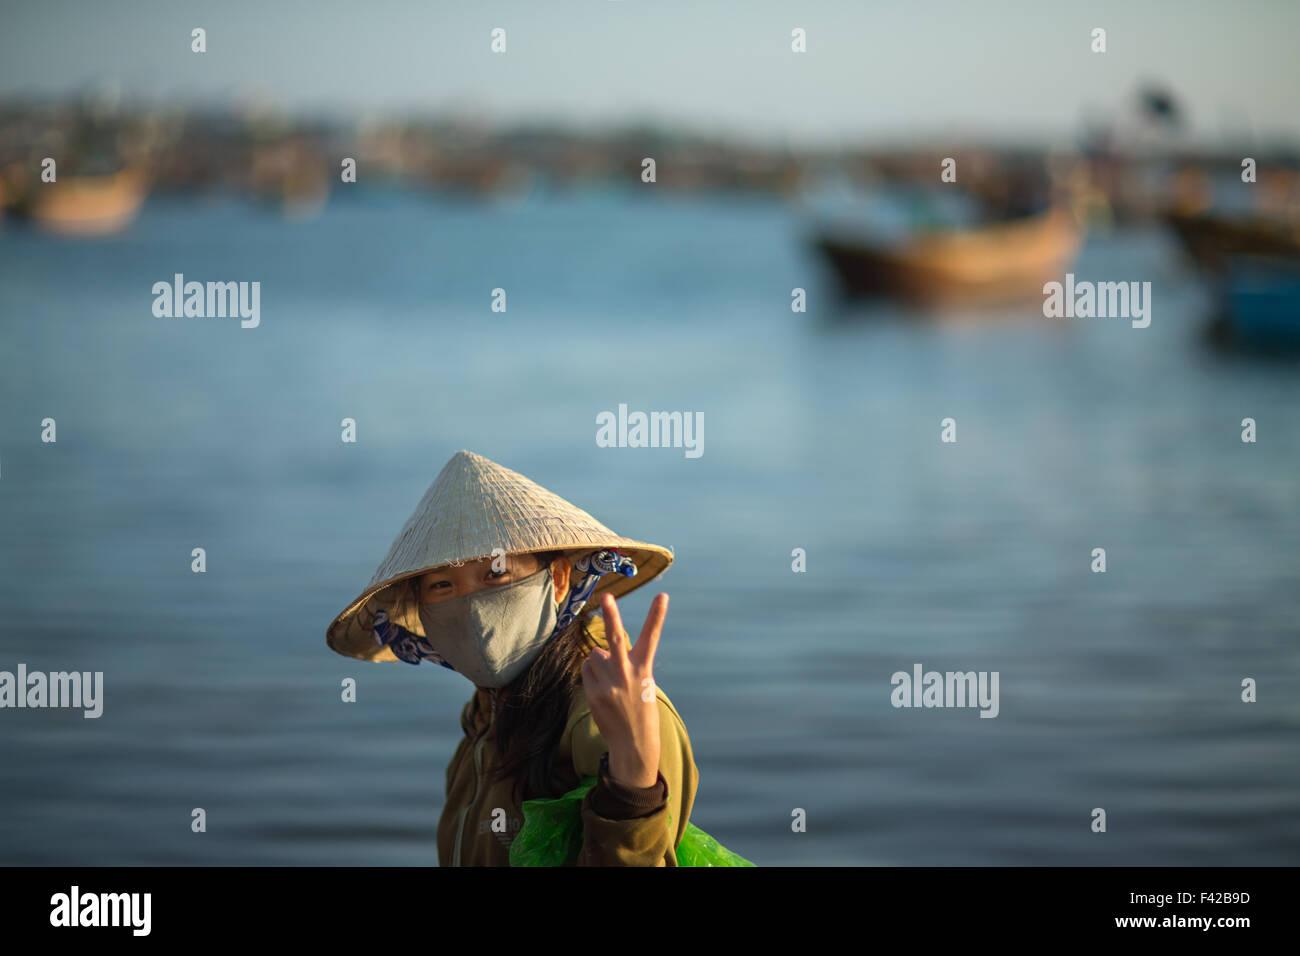 Mũi Né fishing village, Bình Thuận Province, Vietnam - Stock Image